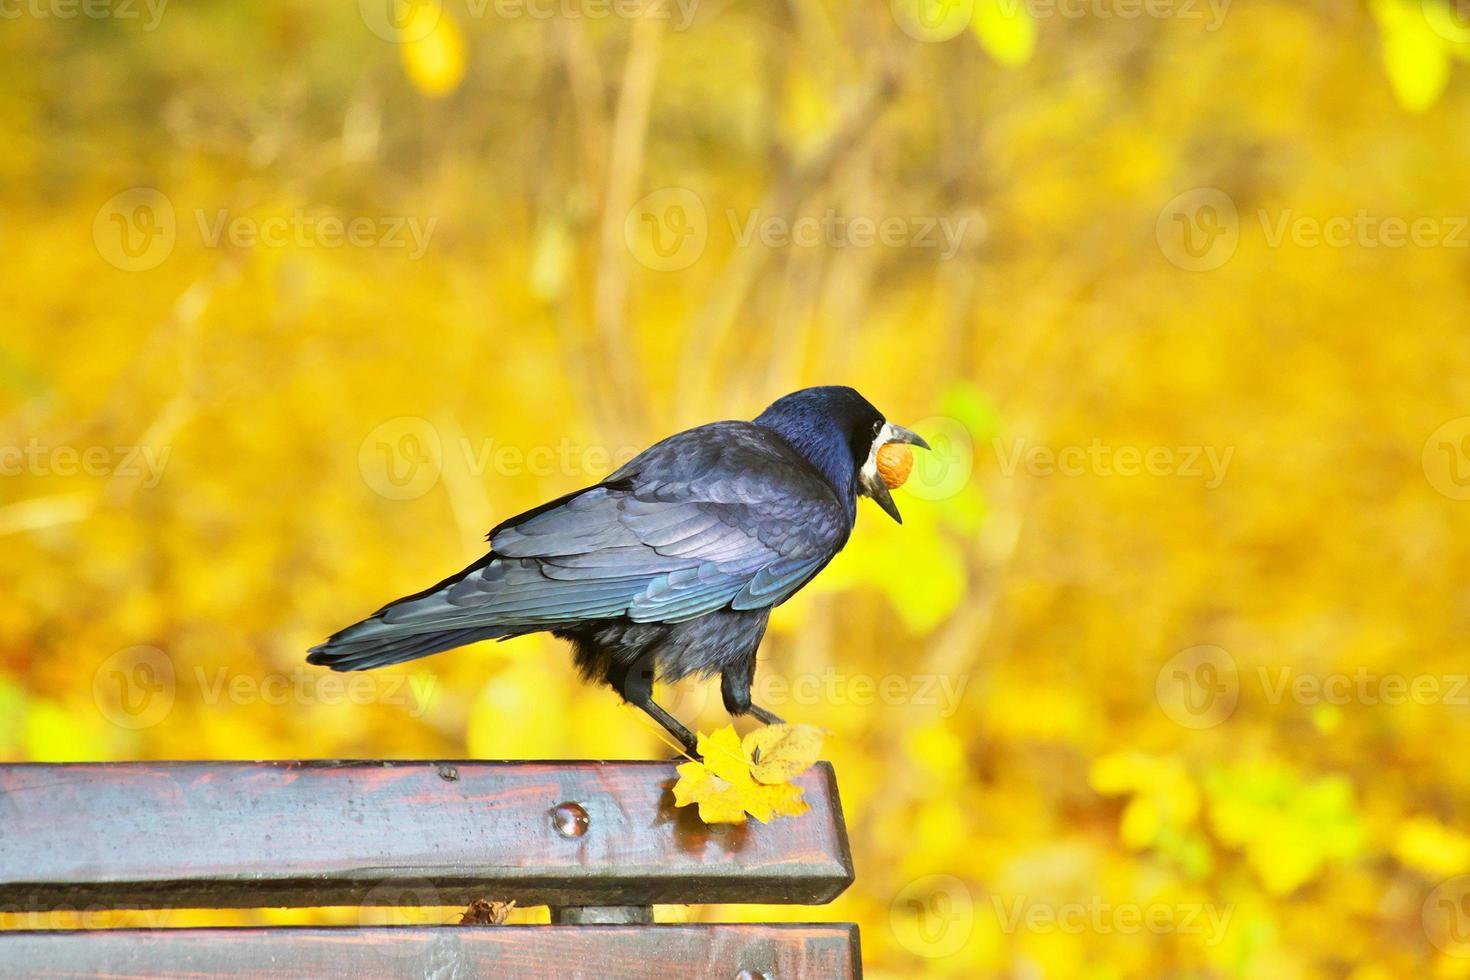 corvo negro sentado no banco foto